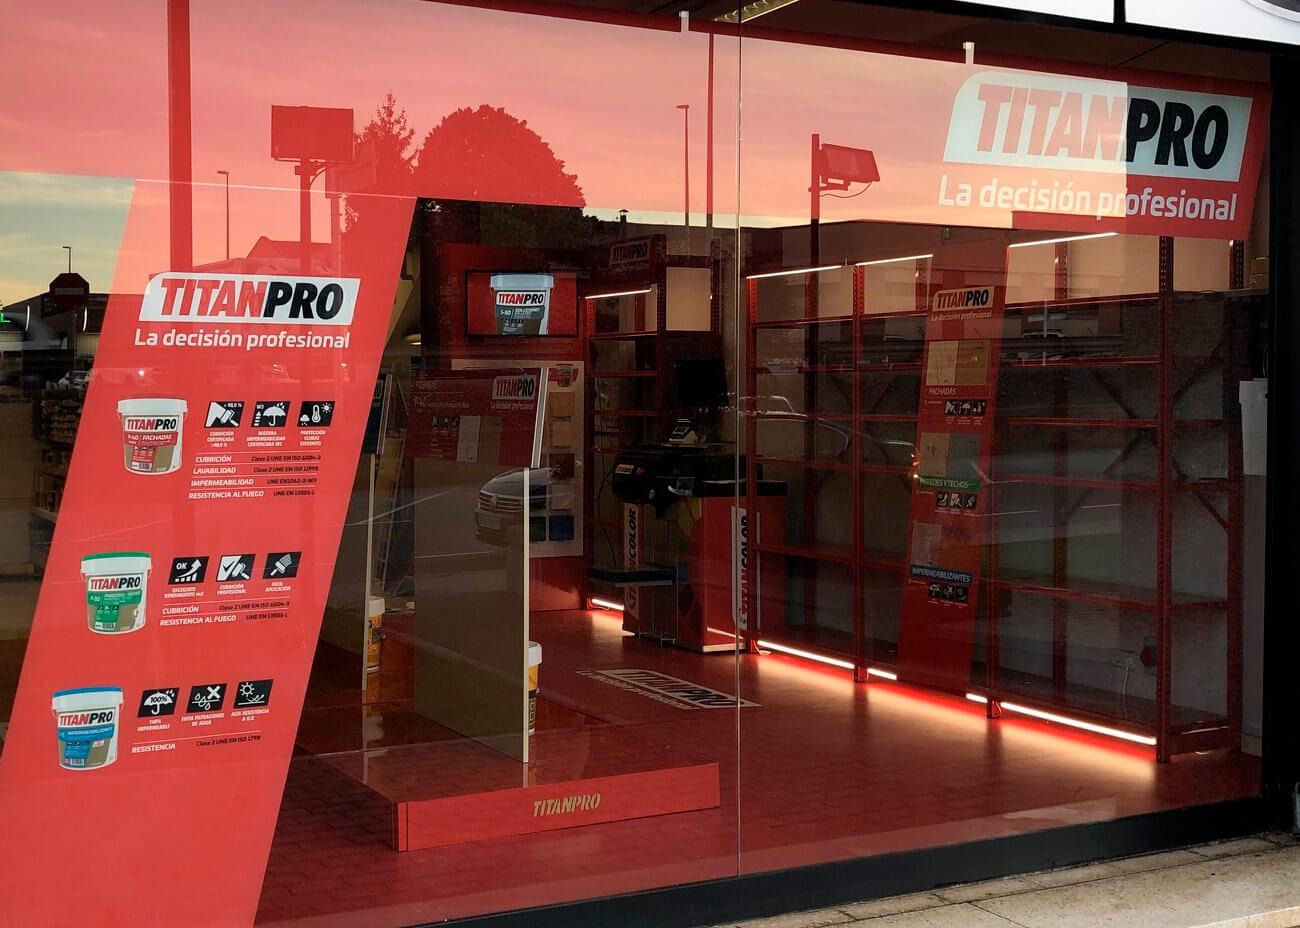 titanpro-img04-caad-retail-design-barcelona